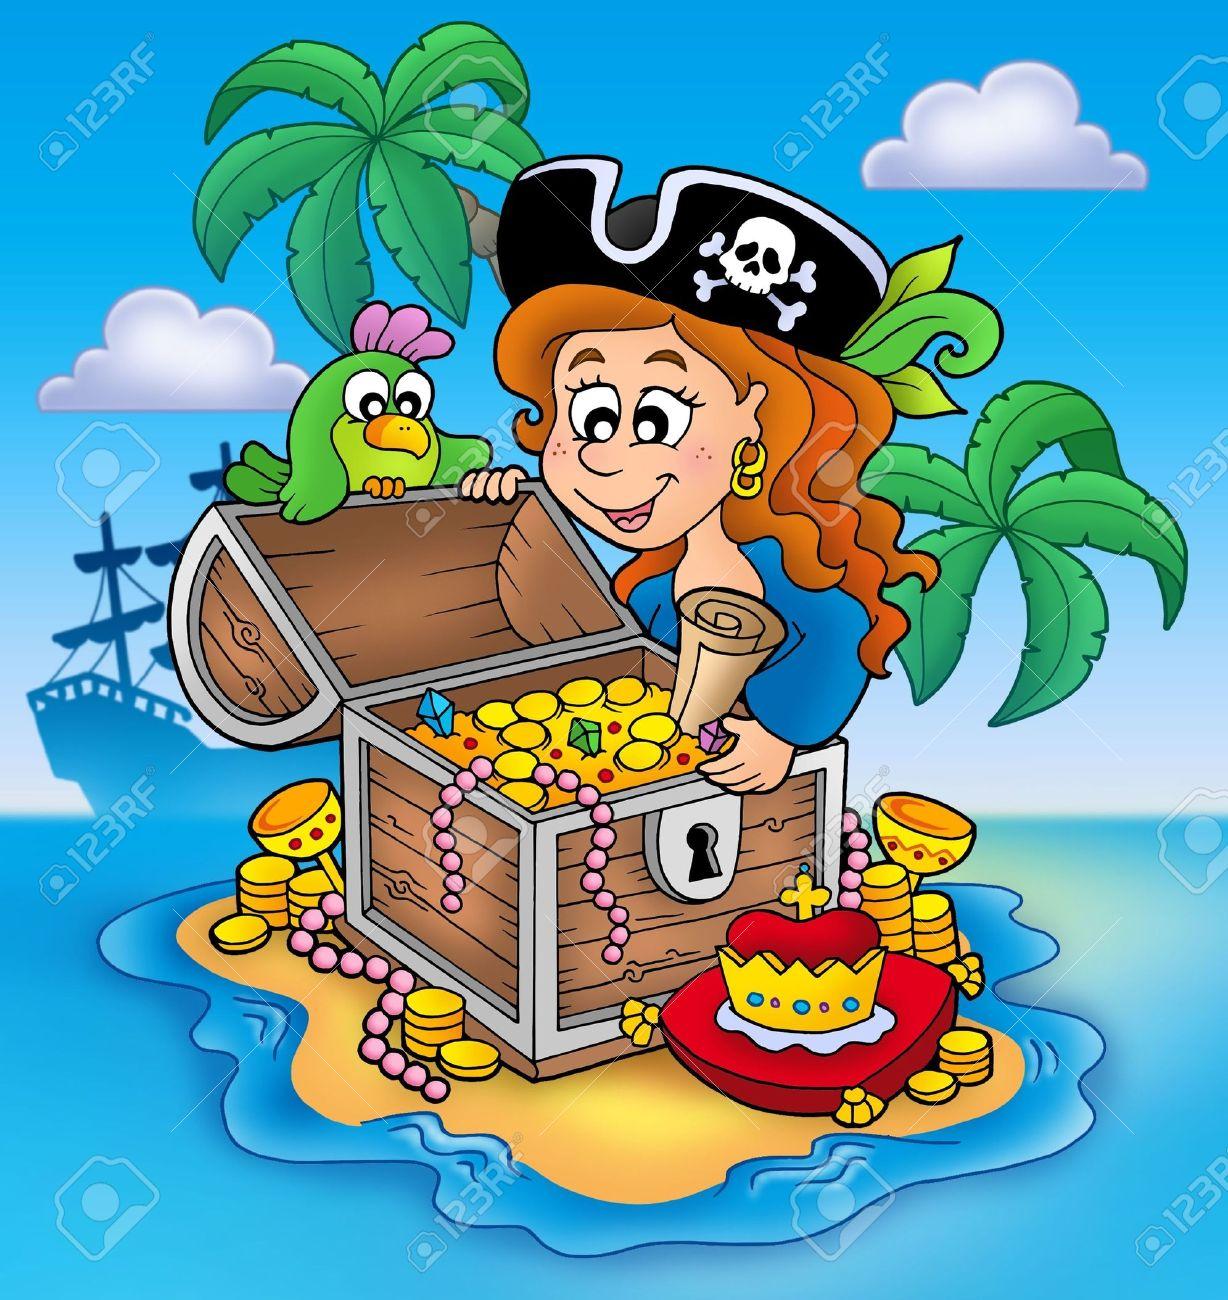 Pirate Girl And Treasure - Color Illustration. Stock Photo, Picture ...